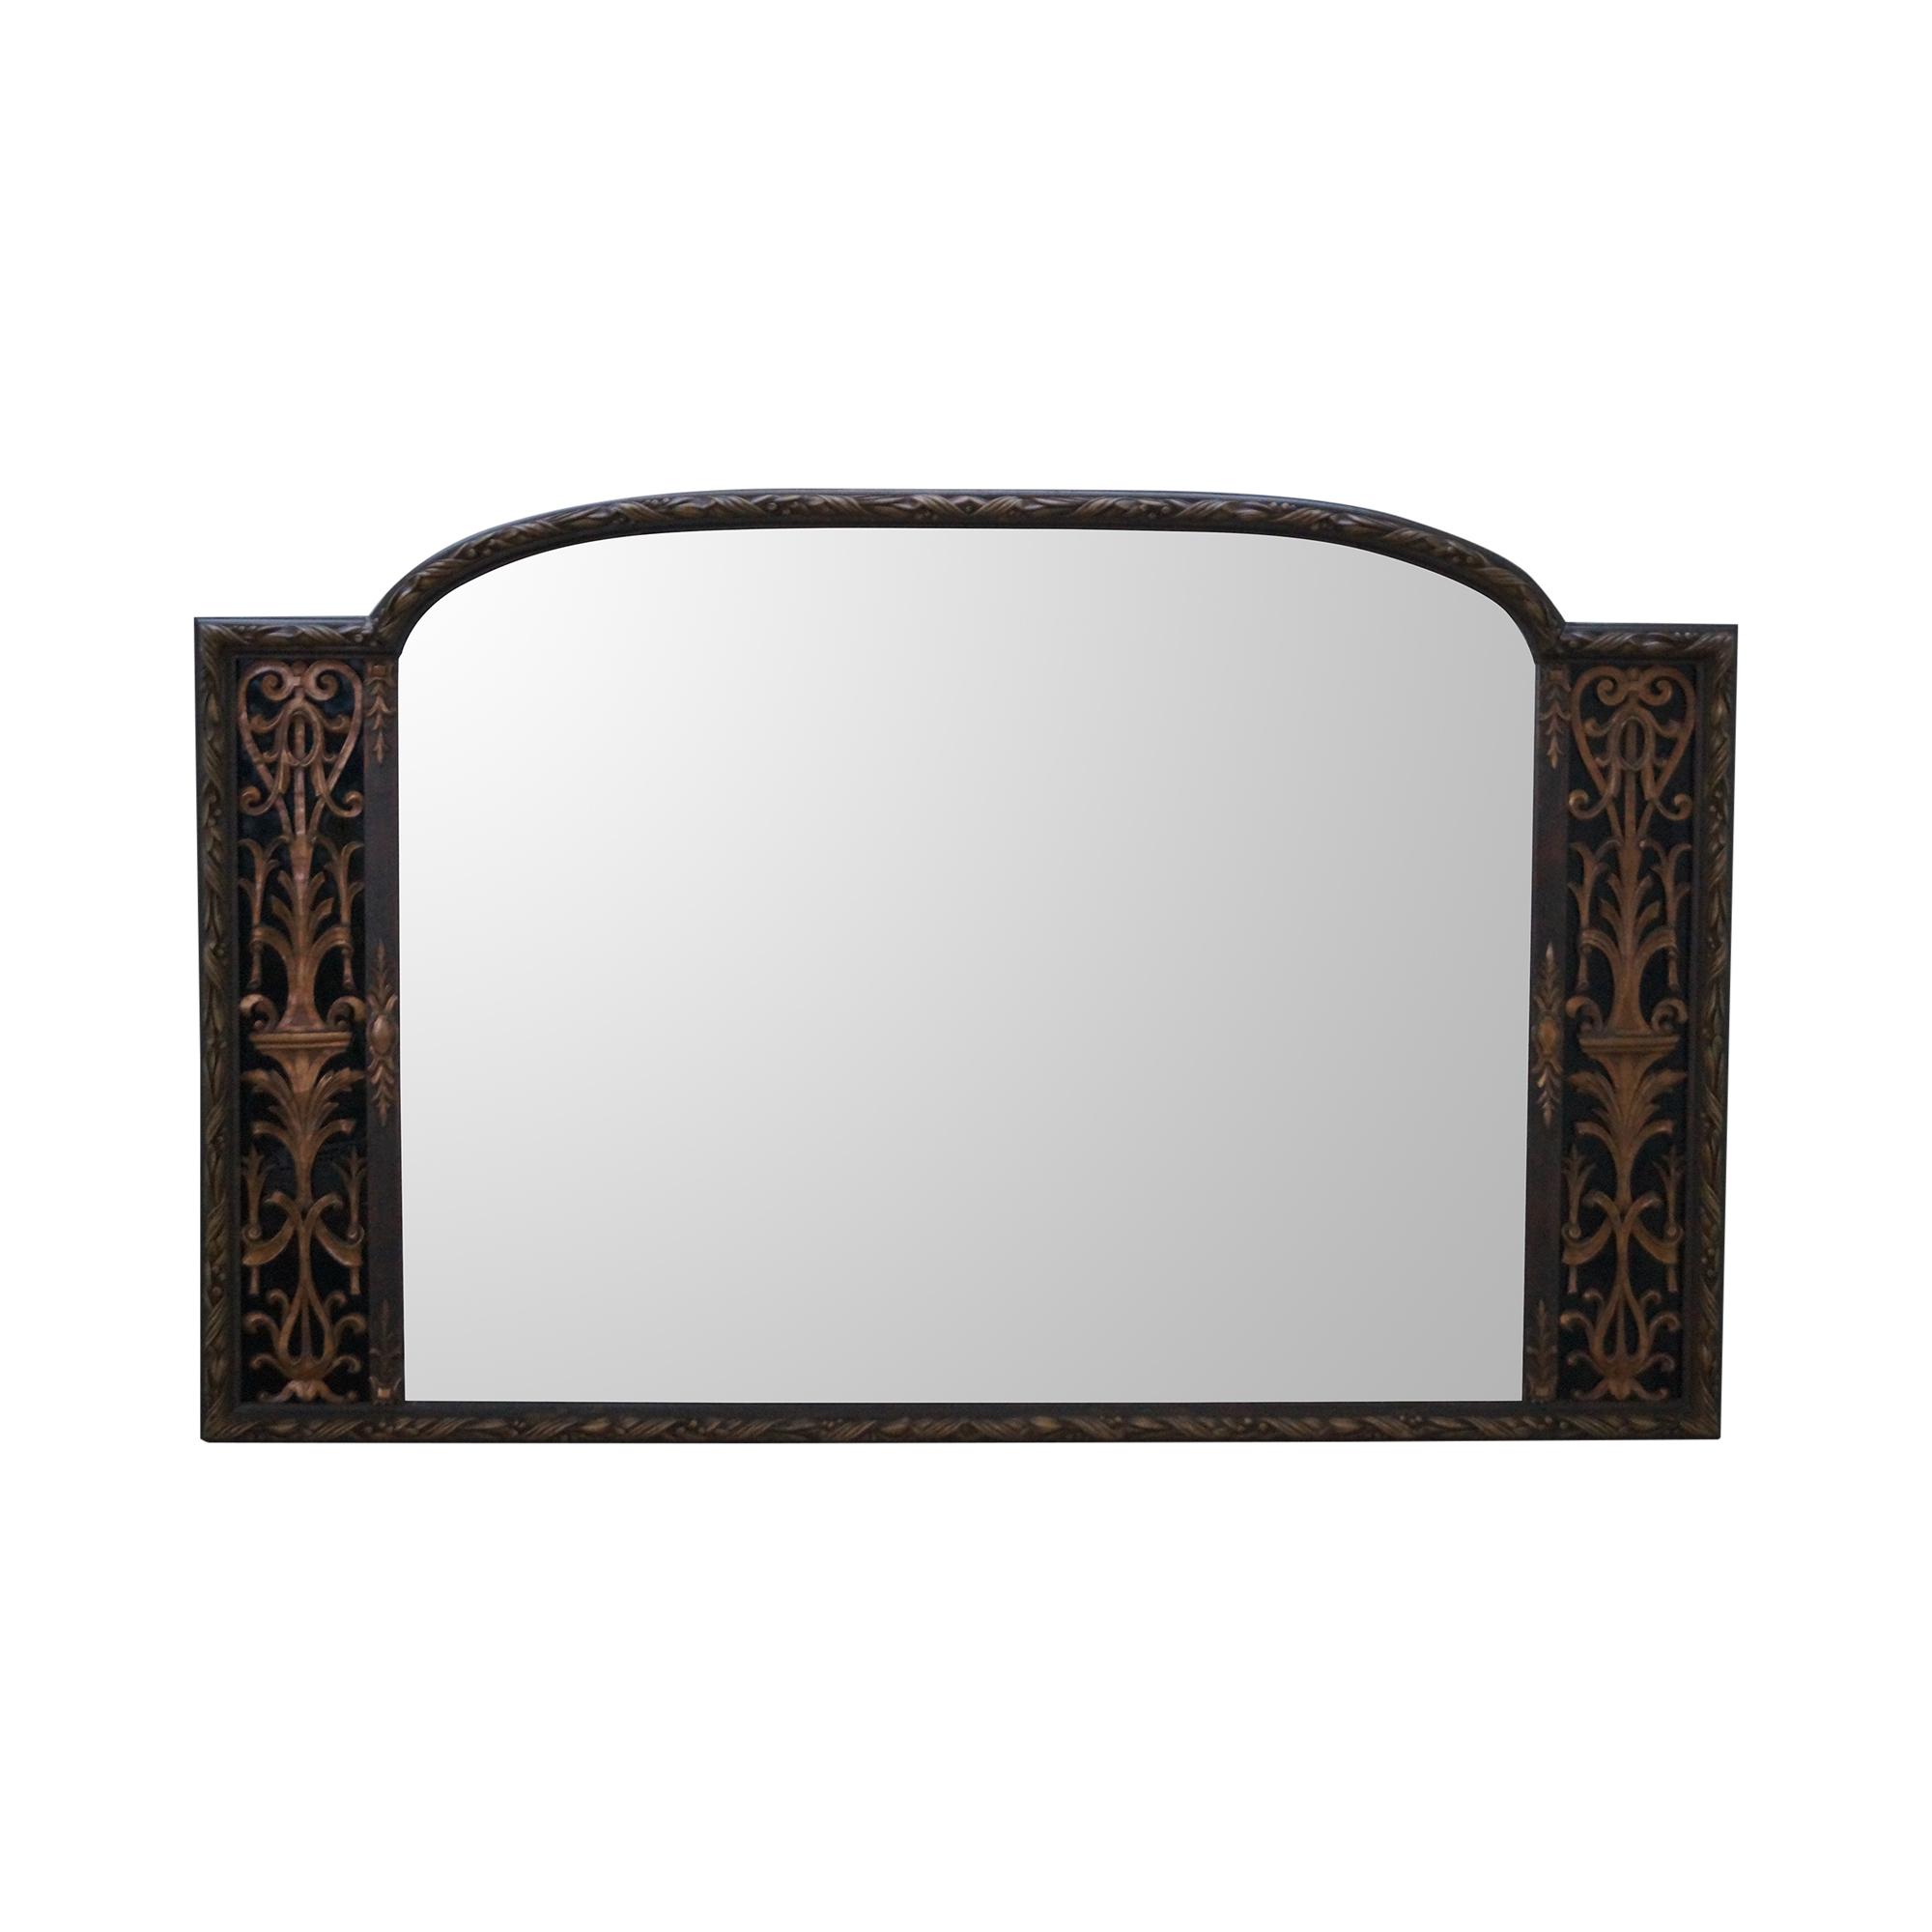 Antique Art Deco Gold Frame Mirror & Black Glass | Chairish